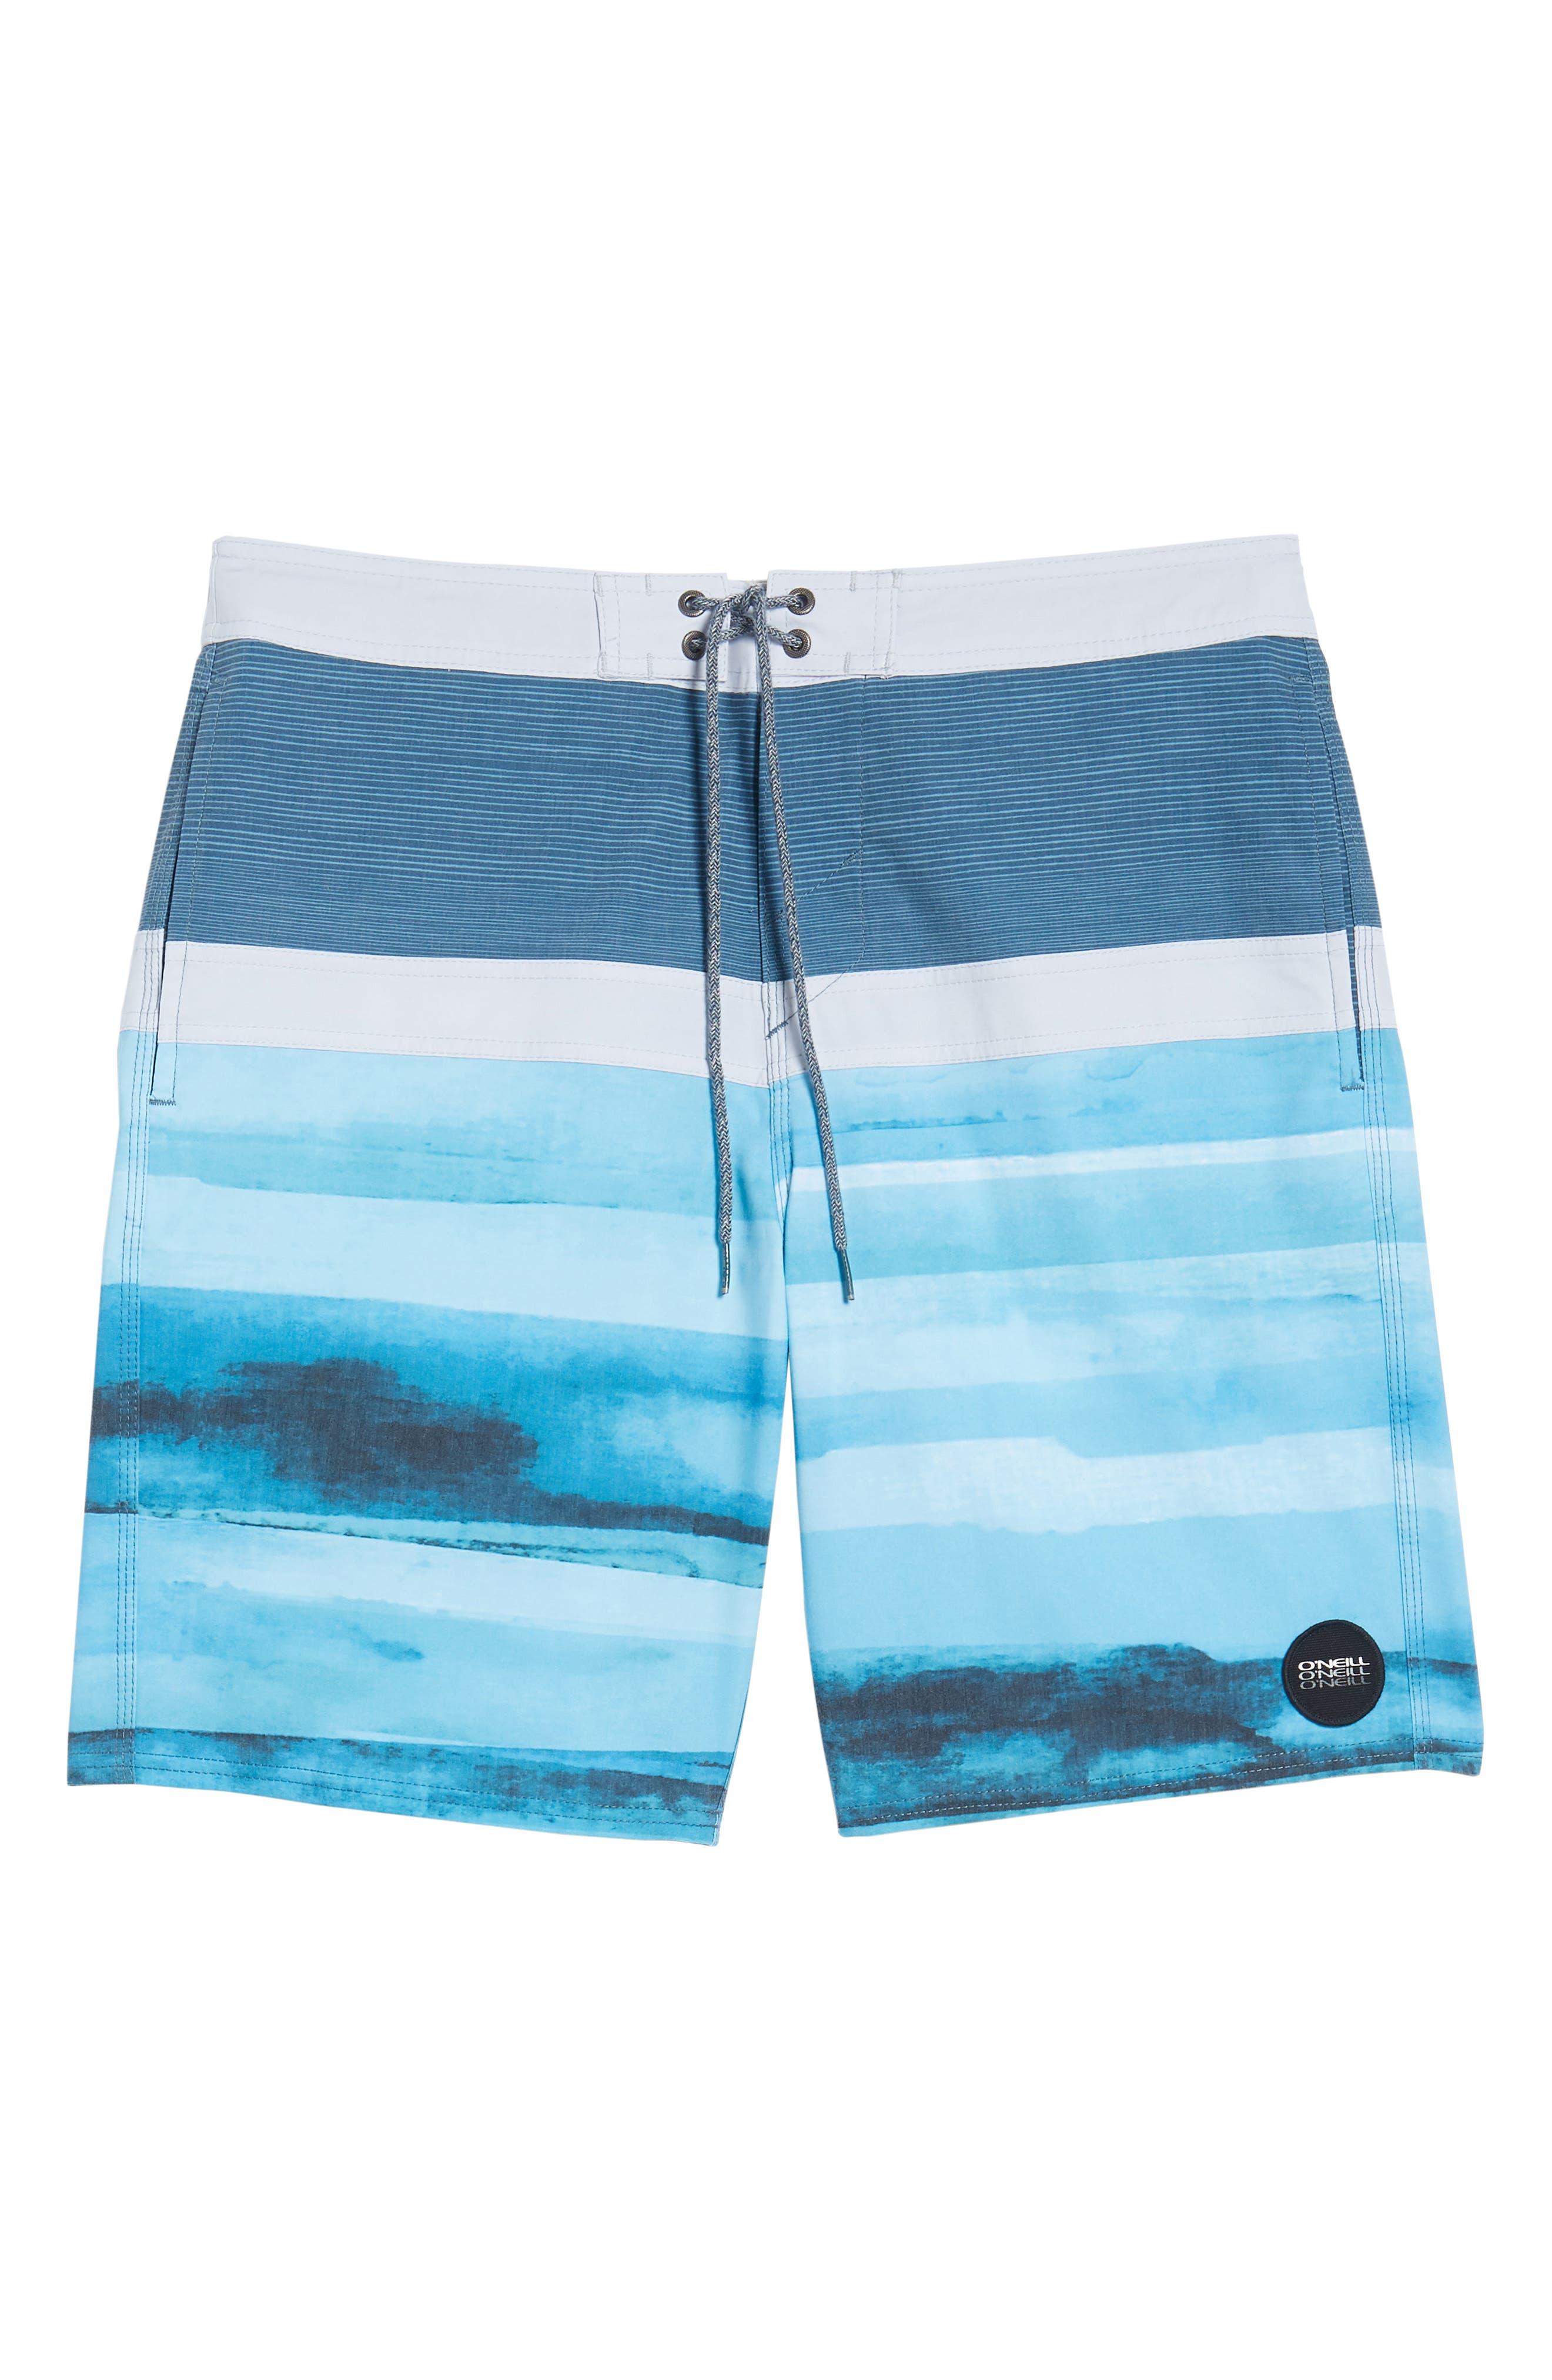 Breaker Cruzer Board Shorts,                             Alternate thumbnail 6, color,                             Ocean